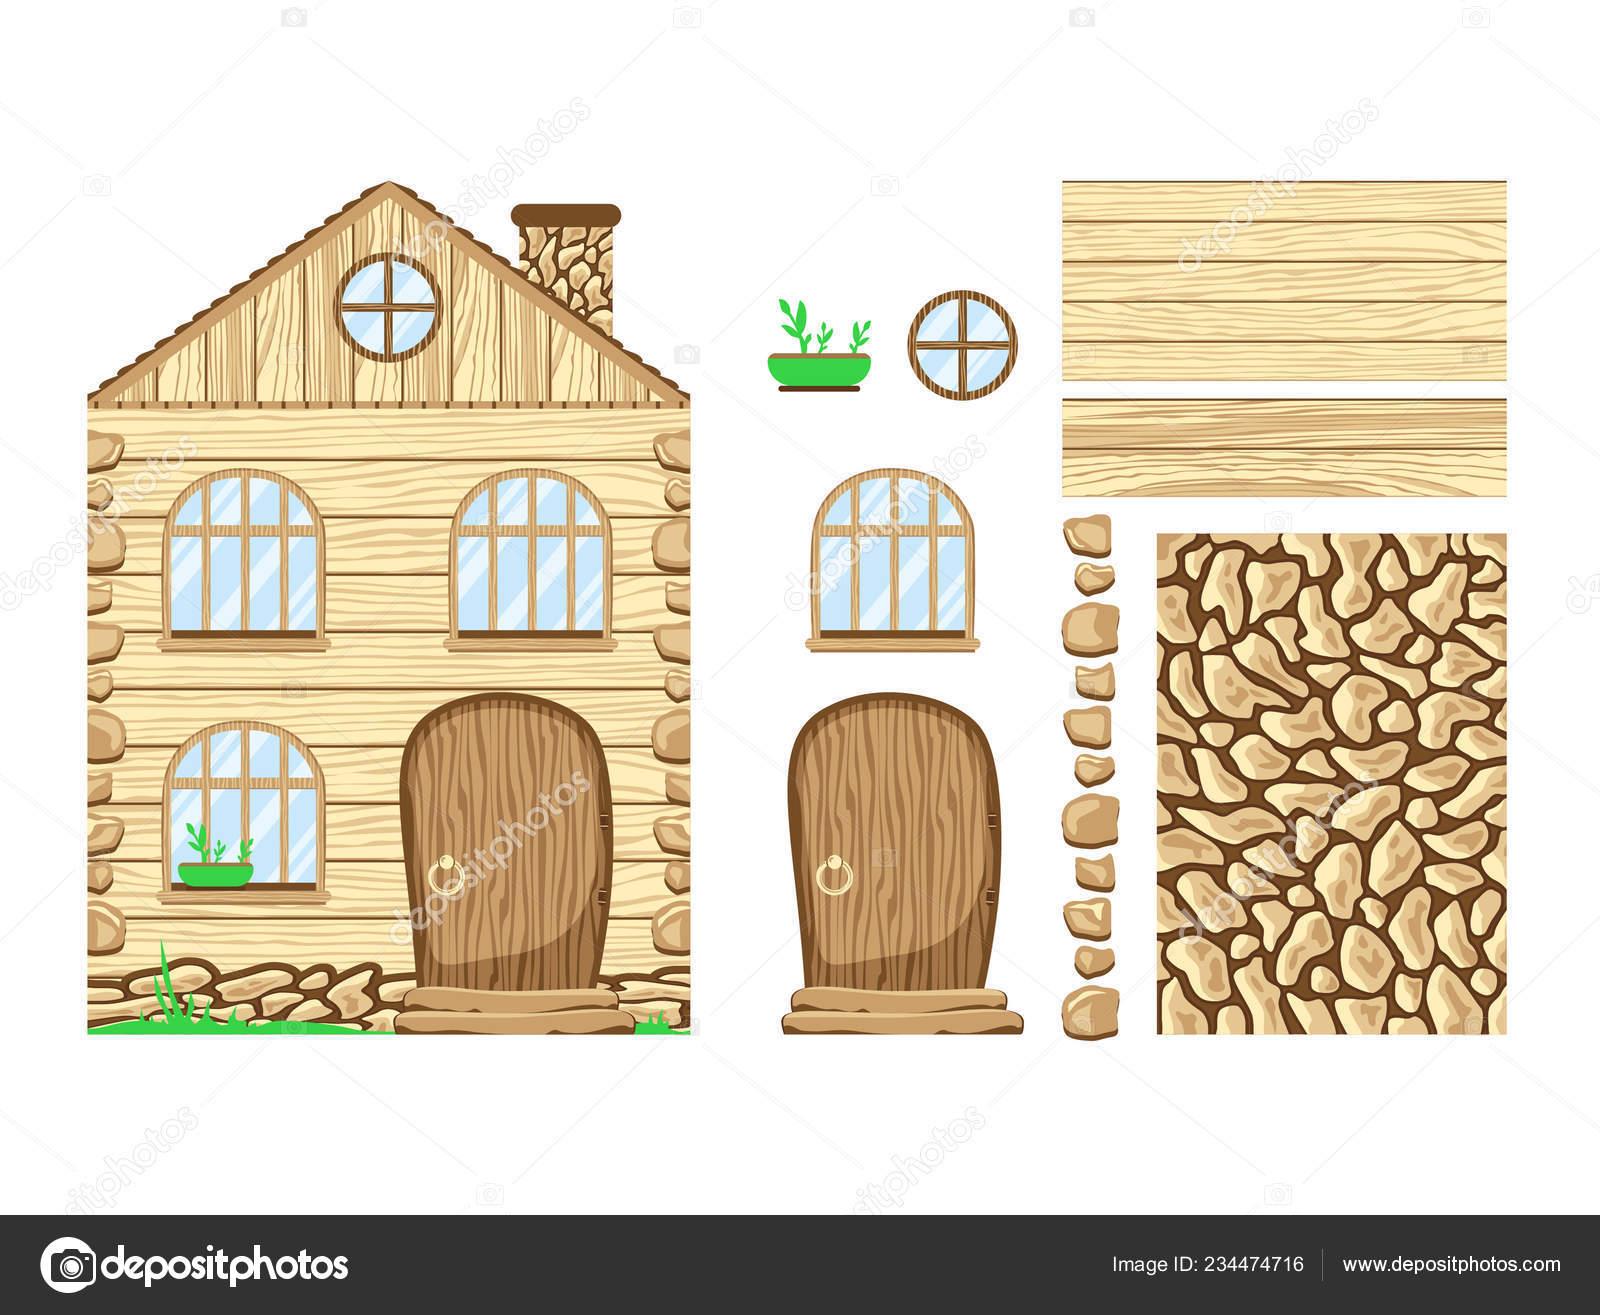 Clipart Wood House Wooden House Wonderland Set Clipart Stock